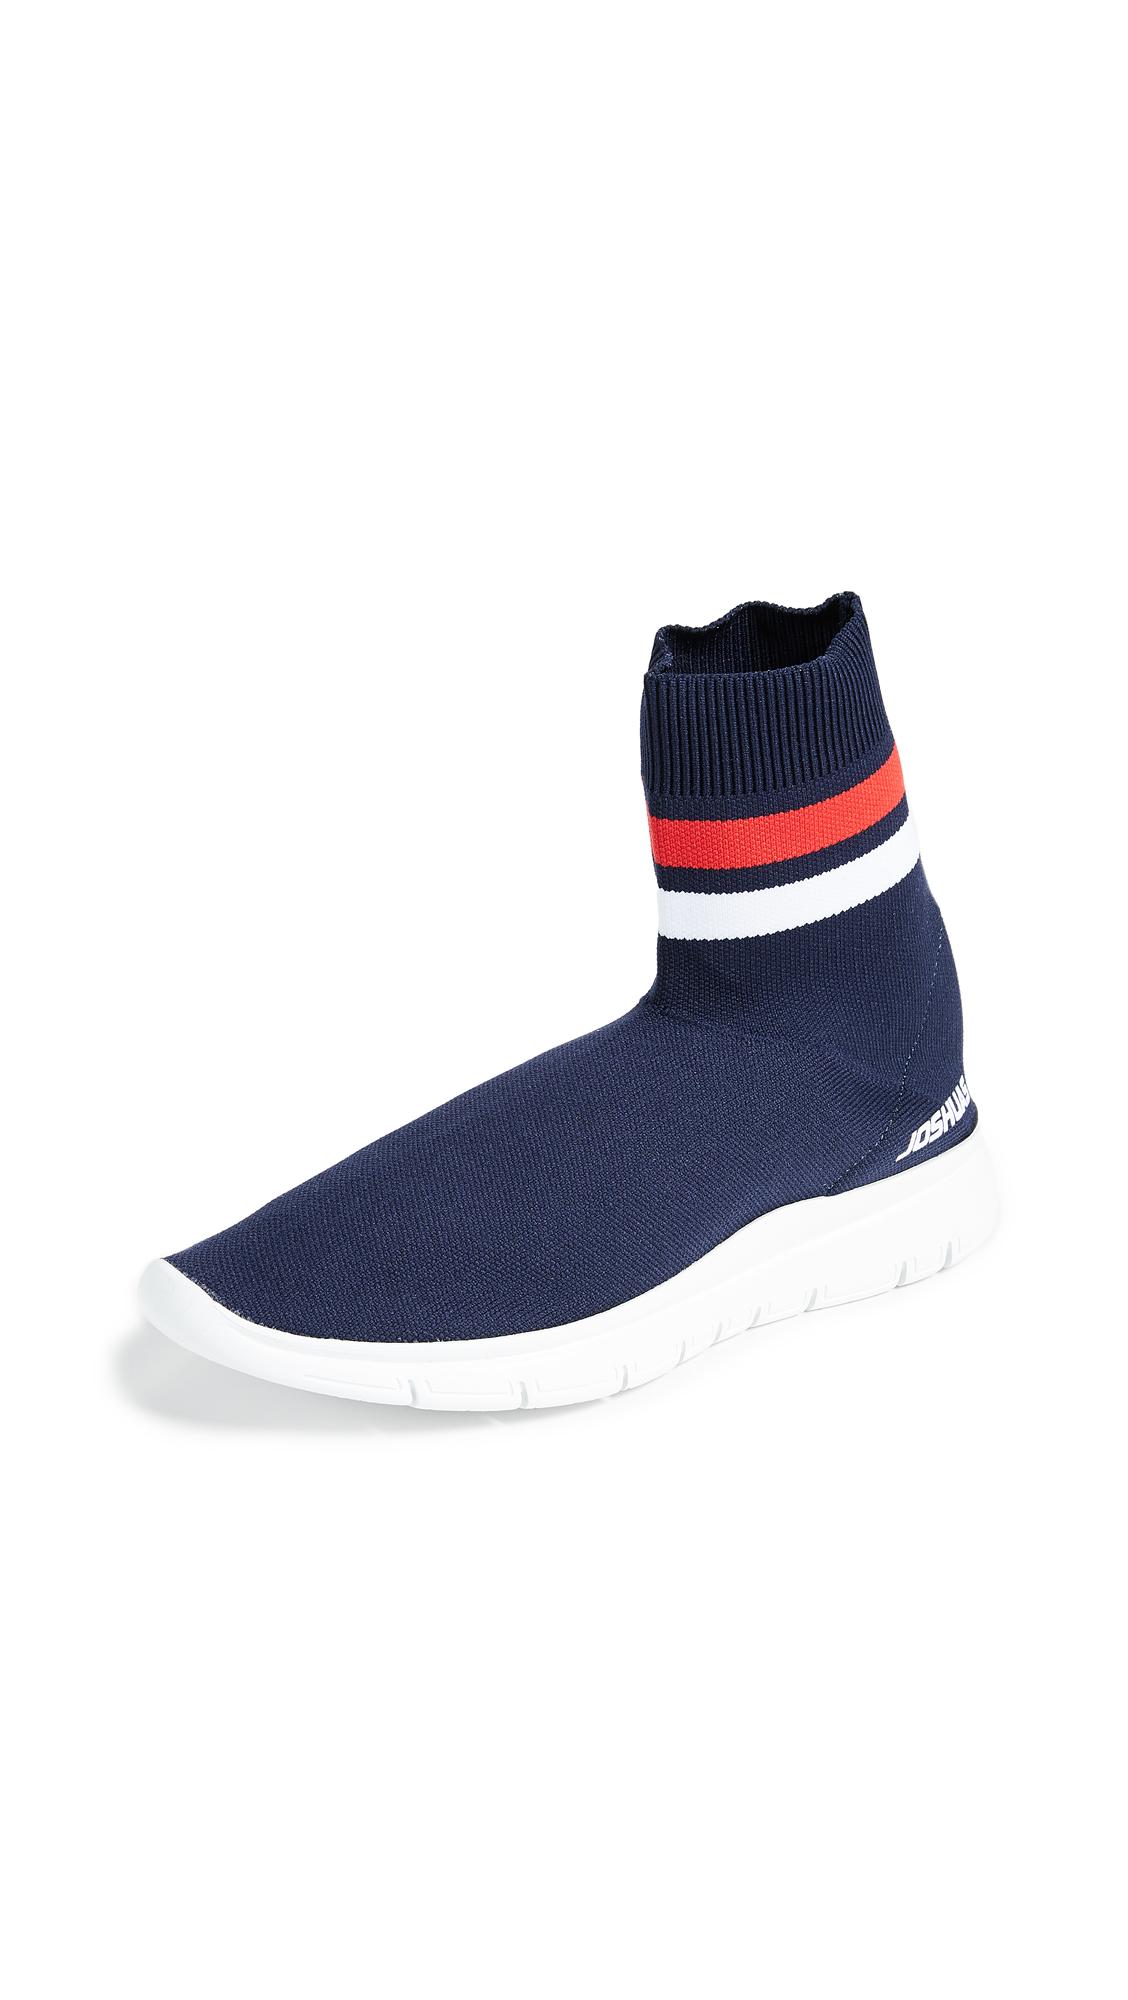 Joshua Sanders Jump Sock Booties - Navy